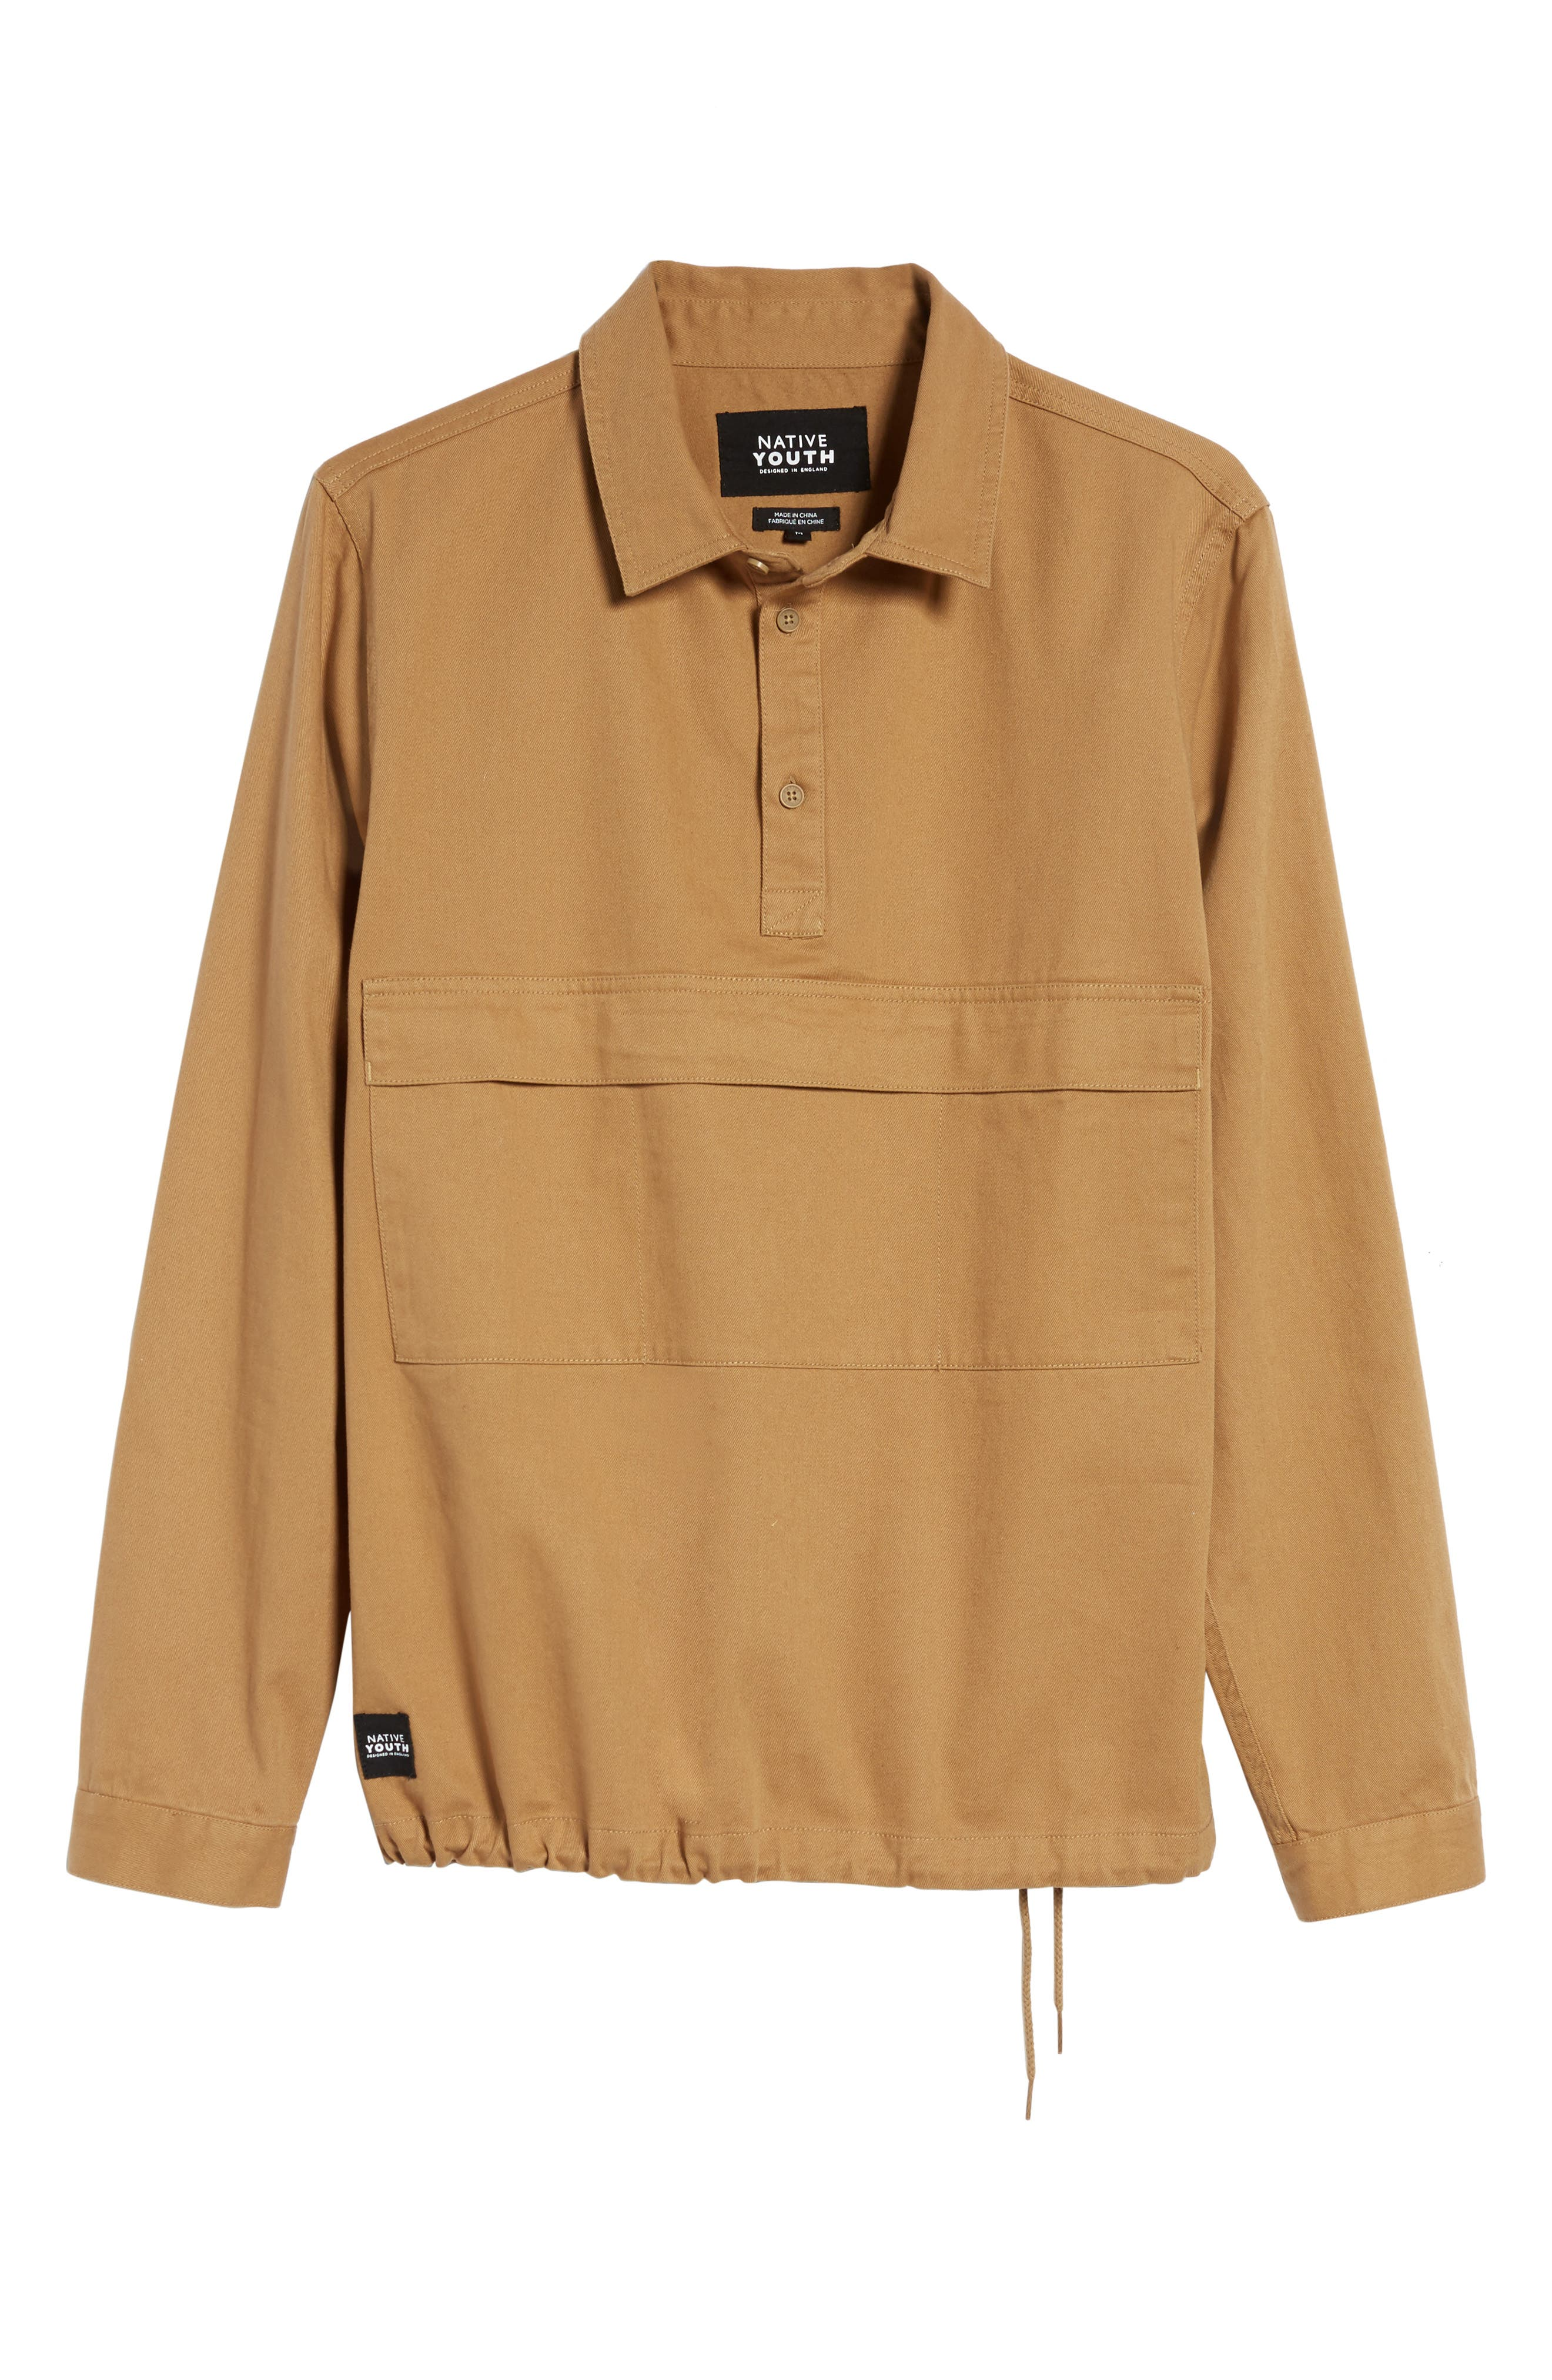 Woodside Twill Shirt,                             Alternate thumbnail 6, color,                             Sand